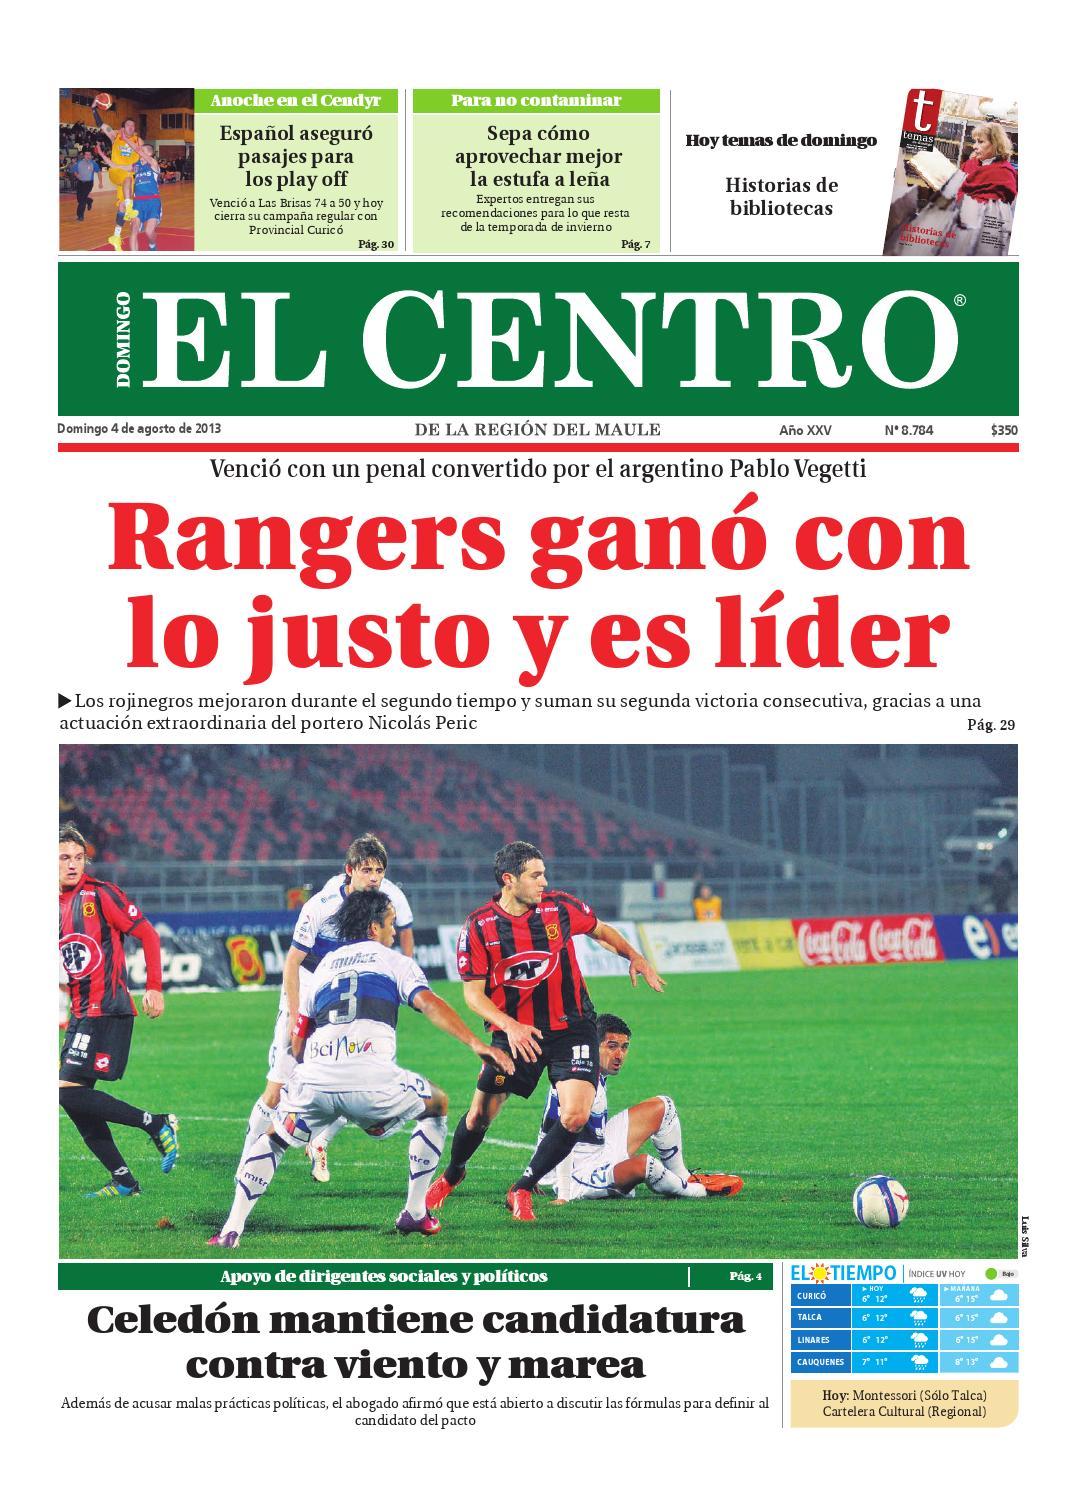 Diario 04 08 2013 by Diario El Centro S.A - issuu 8805bec8d4d13